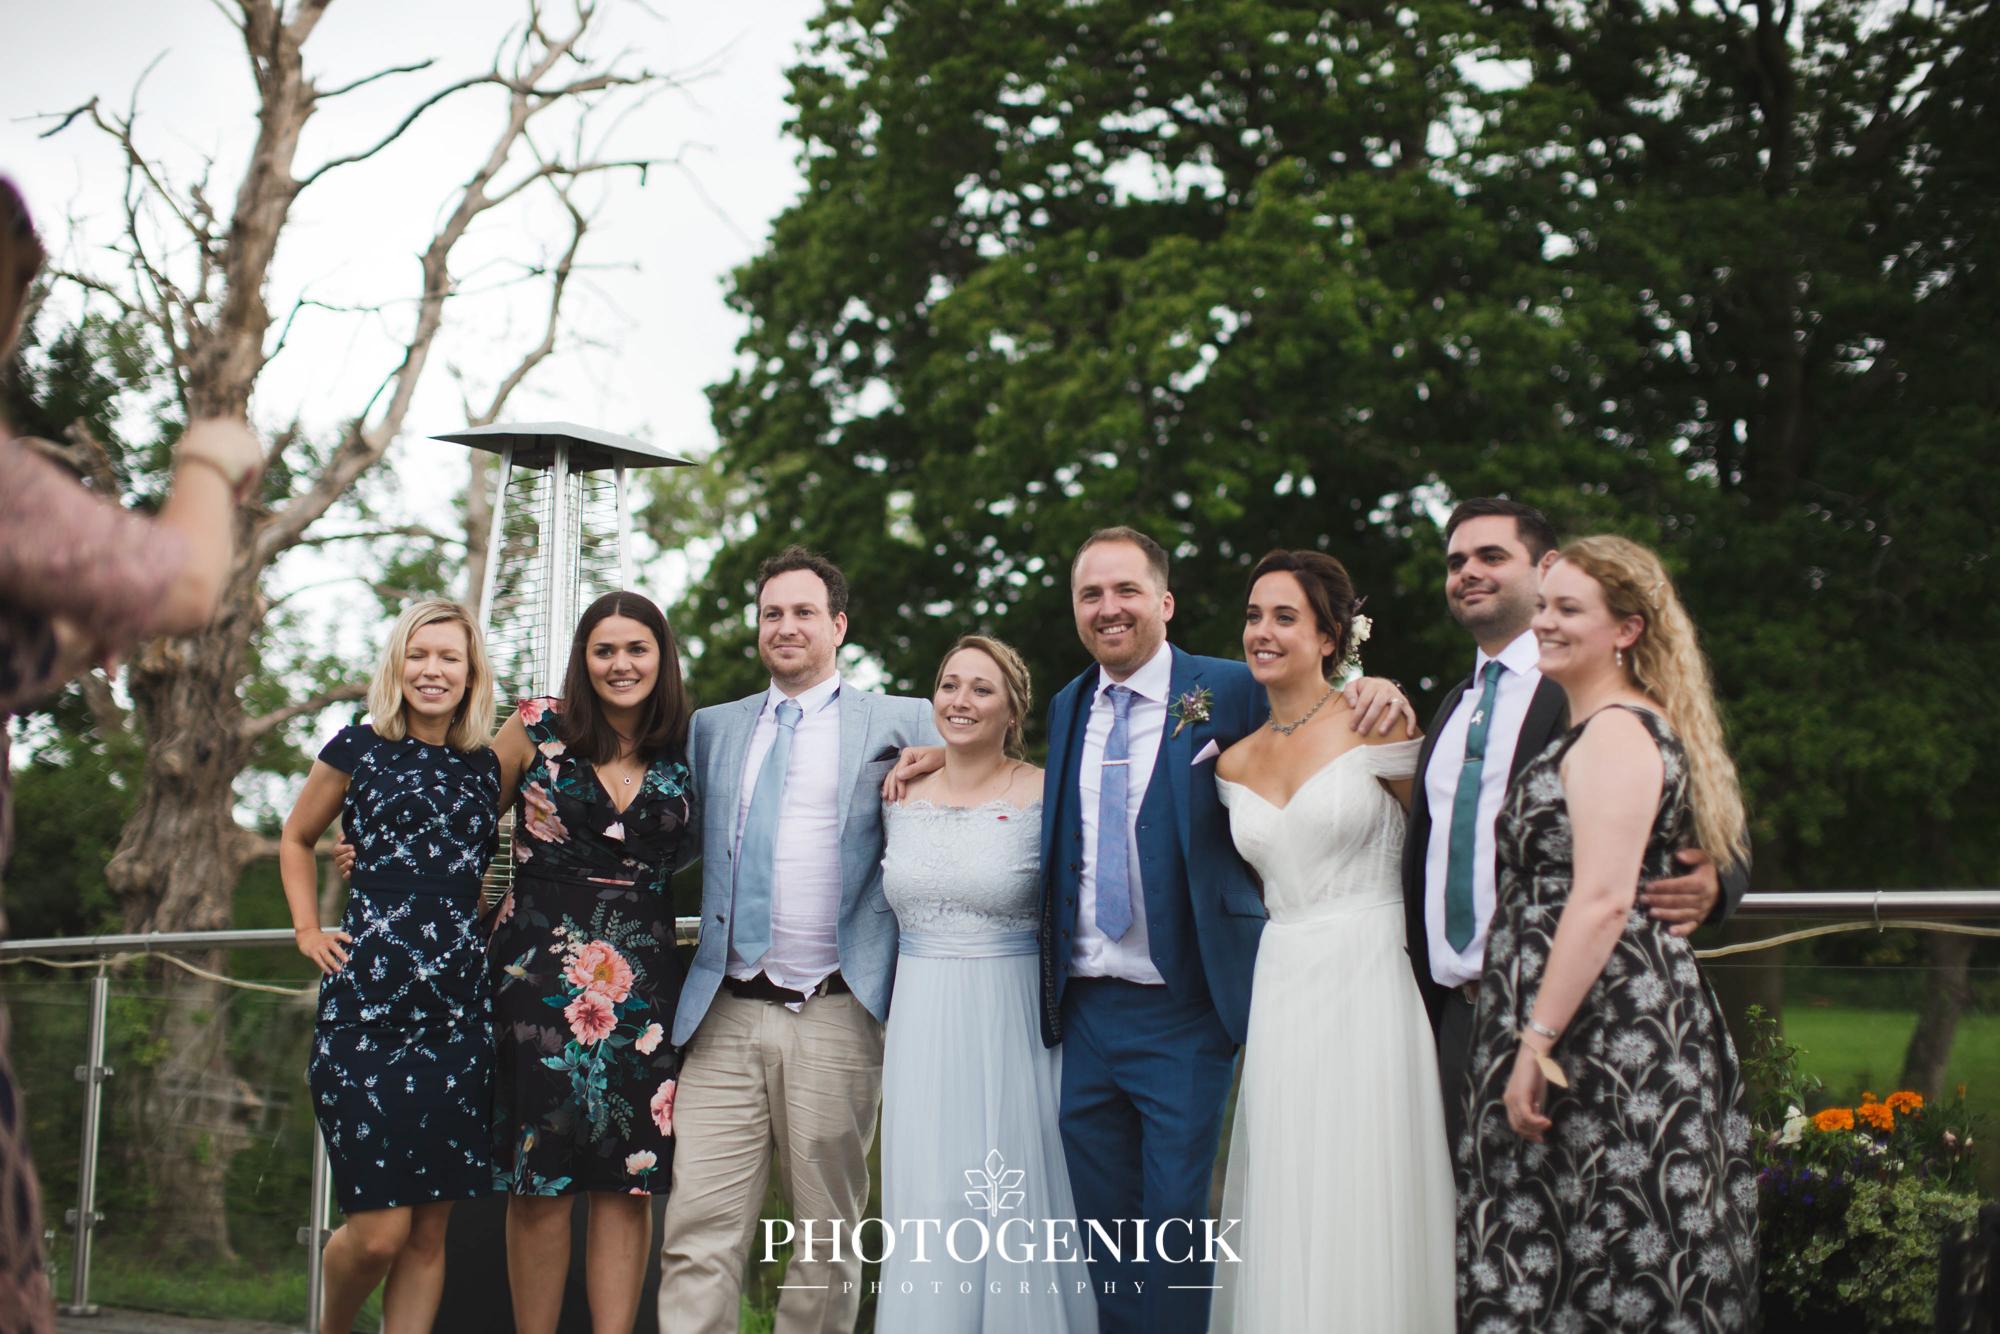 oldwalls gower wedding photographers-55.jpg